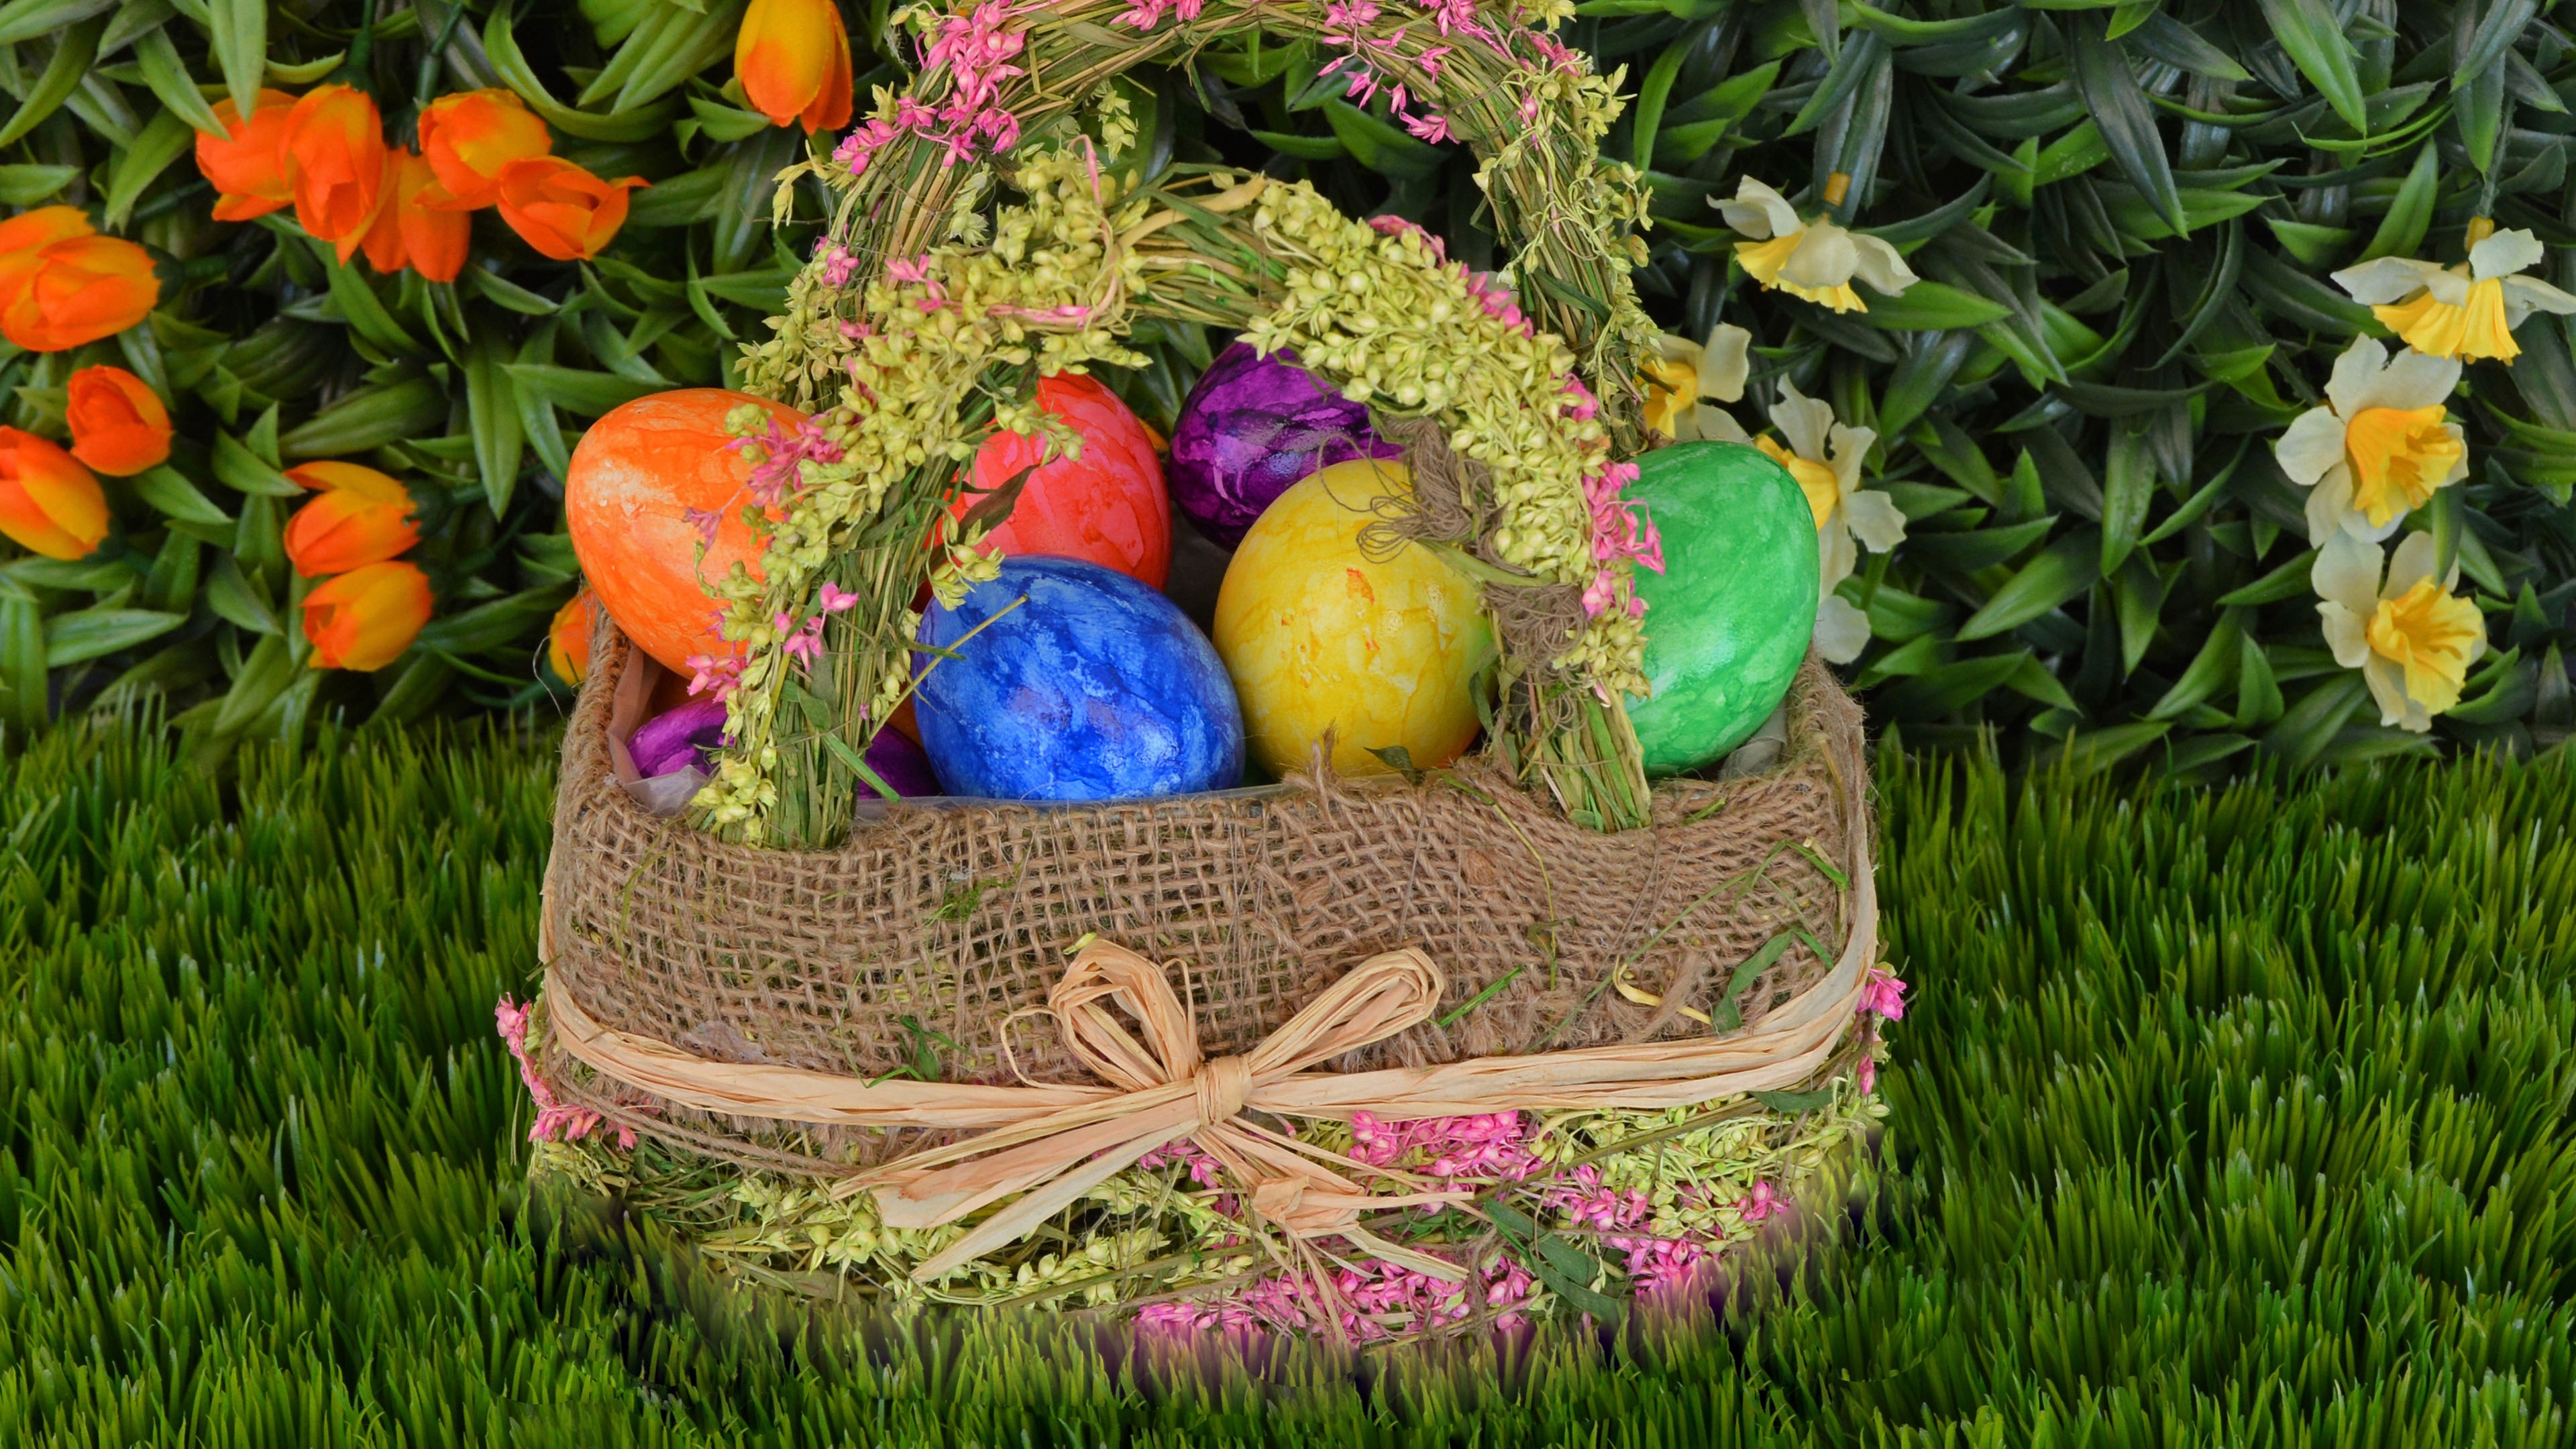 easter eggs basket easter eggs 4k 1538345229 - easter eggs, basket, easter, eggs 4k - easter eggs, Easter, Basket